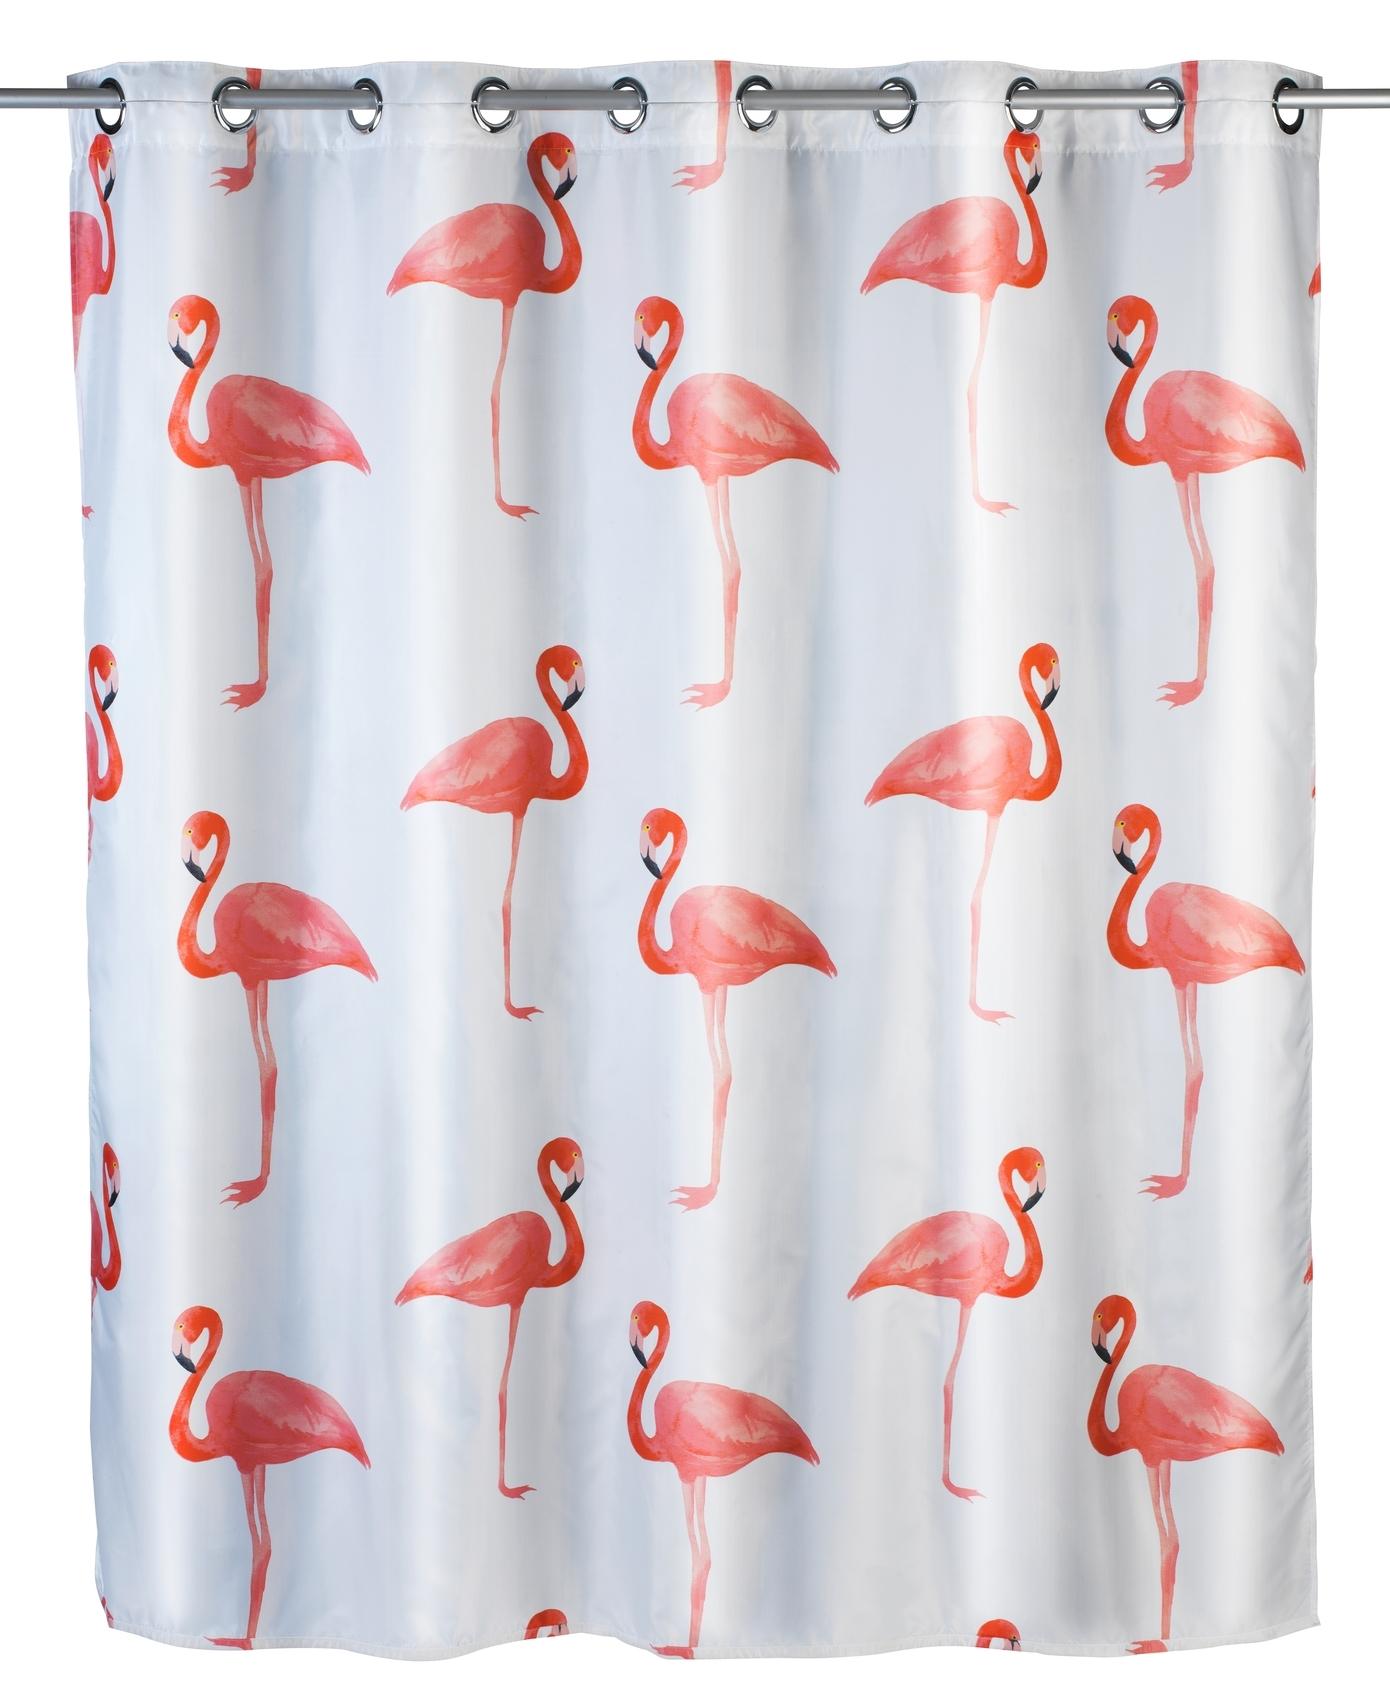 Perdea dus anti-mucegai din poliester, Flamingo Multicolor, 180 x 200 cm somproduct.ro